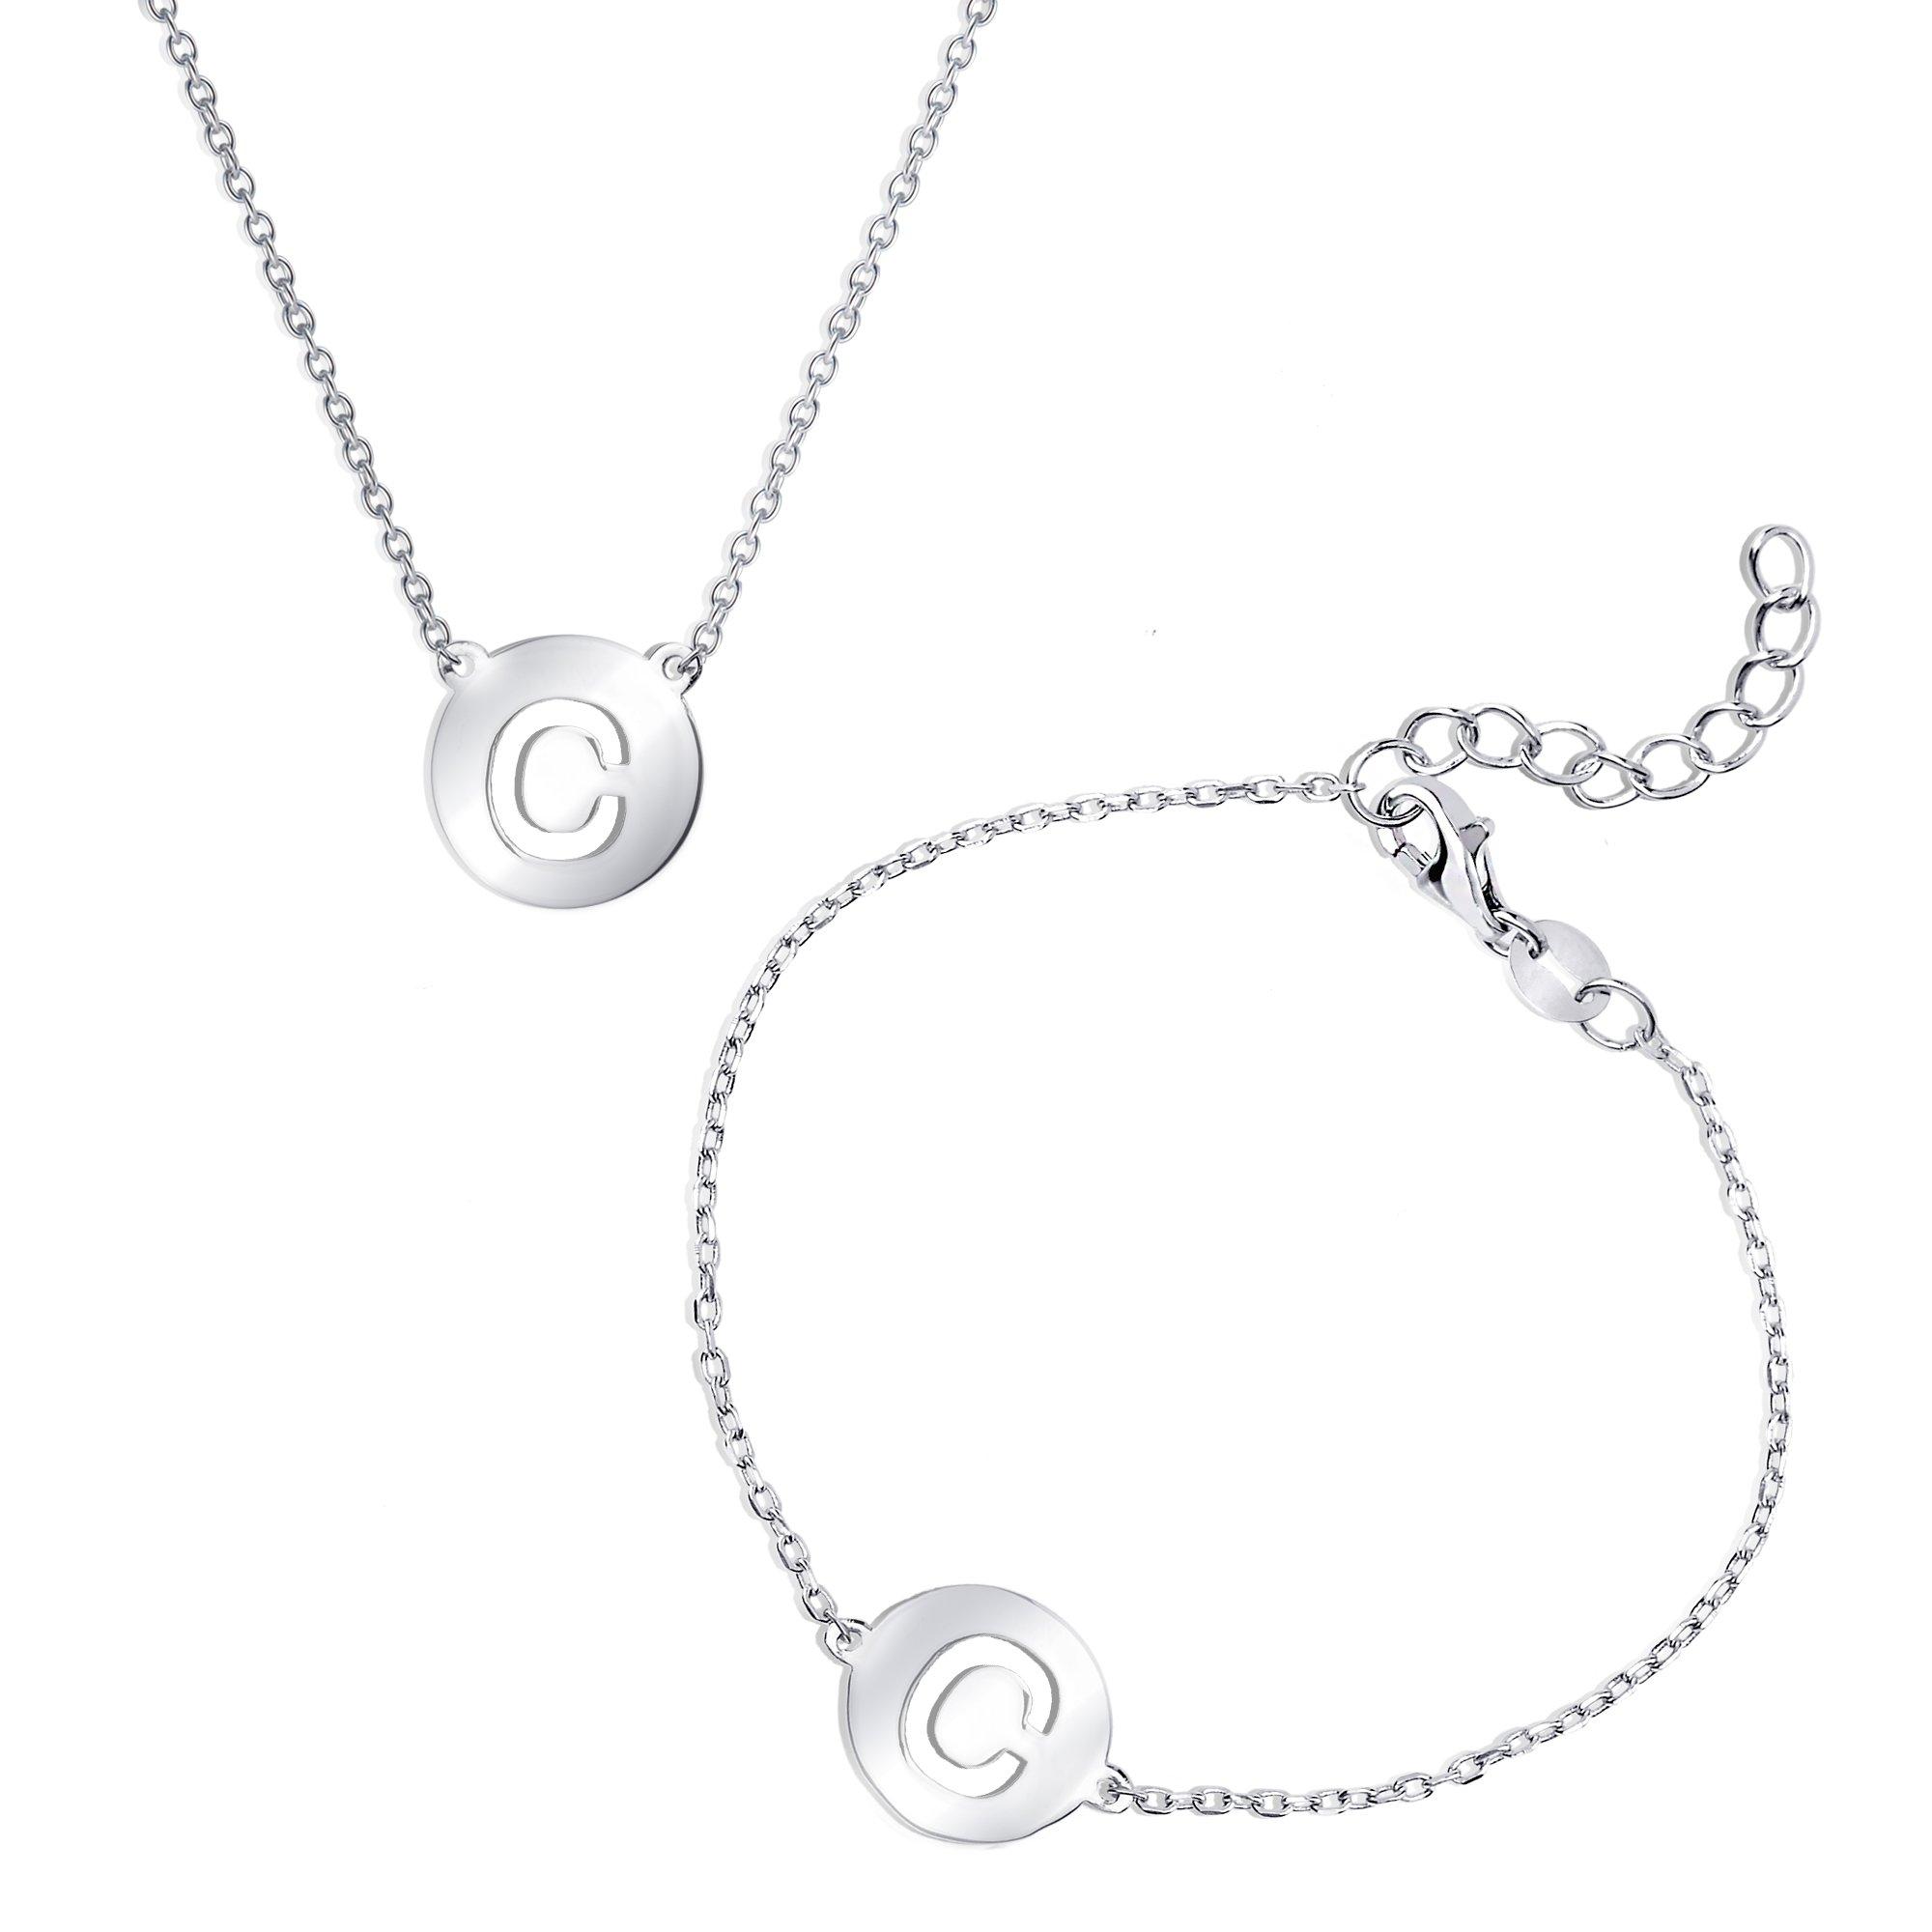 Sterling Silver Italian High Polish Intitial Disc Cut-Out Bracelet & Necklace Set (C) by Beaux Bijoux